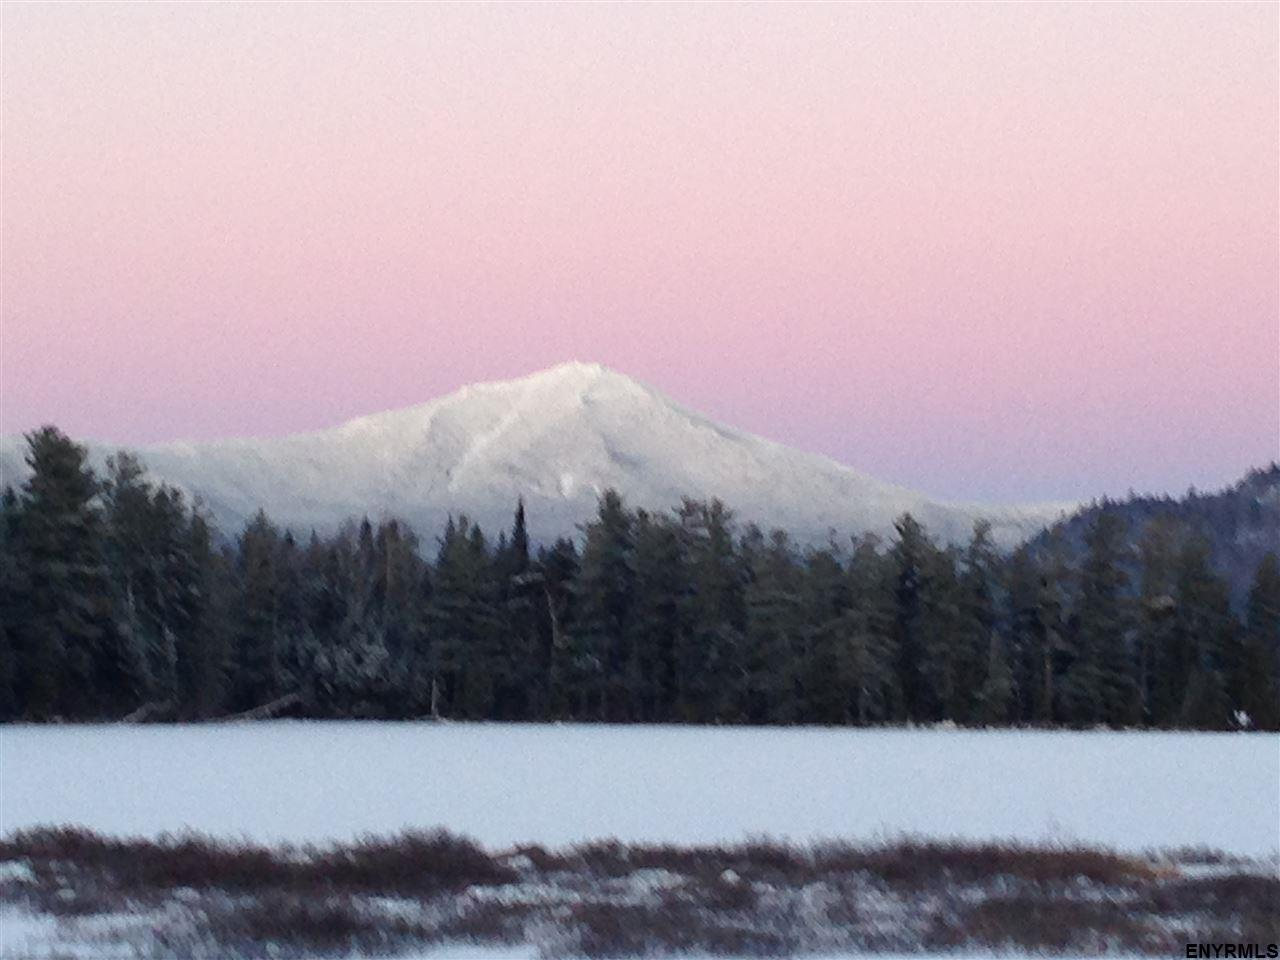 Lake Placid image 23